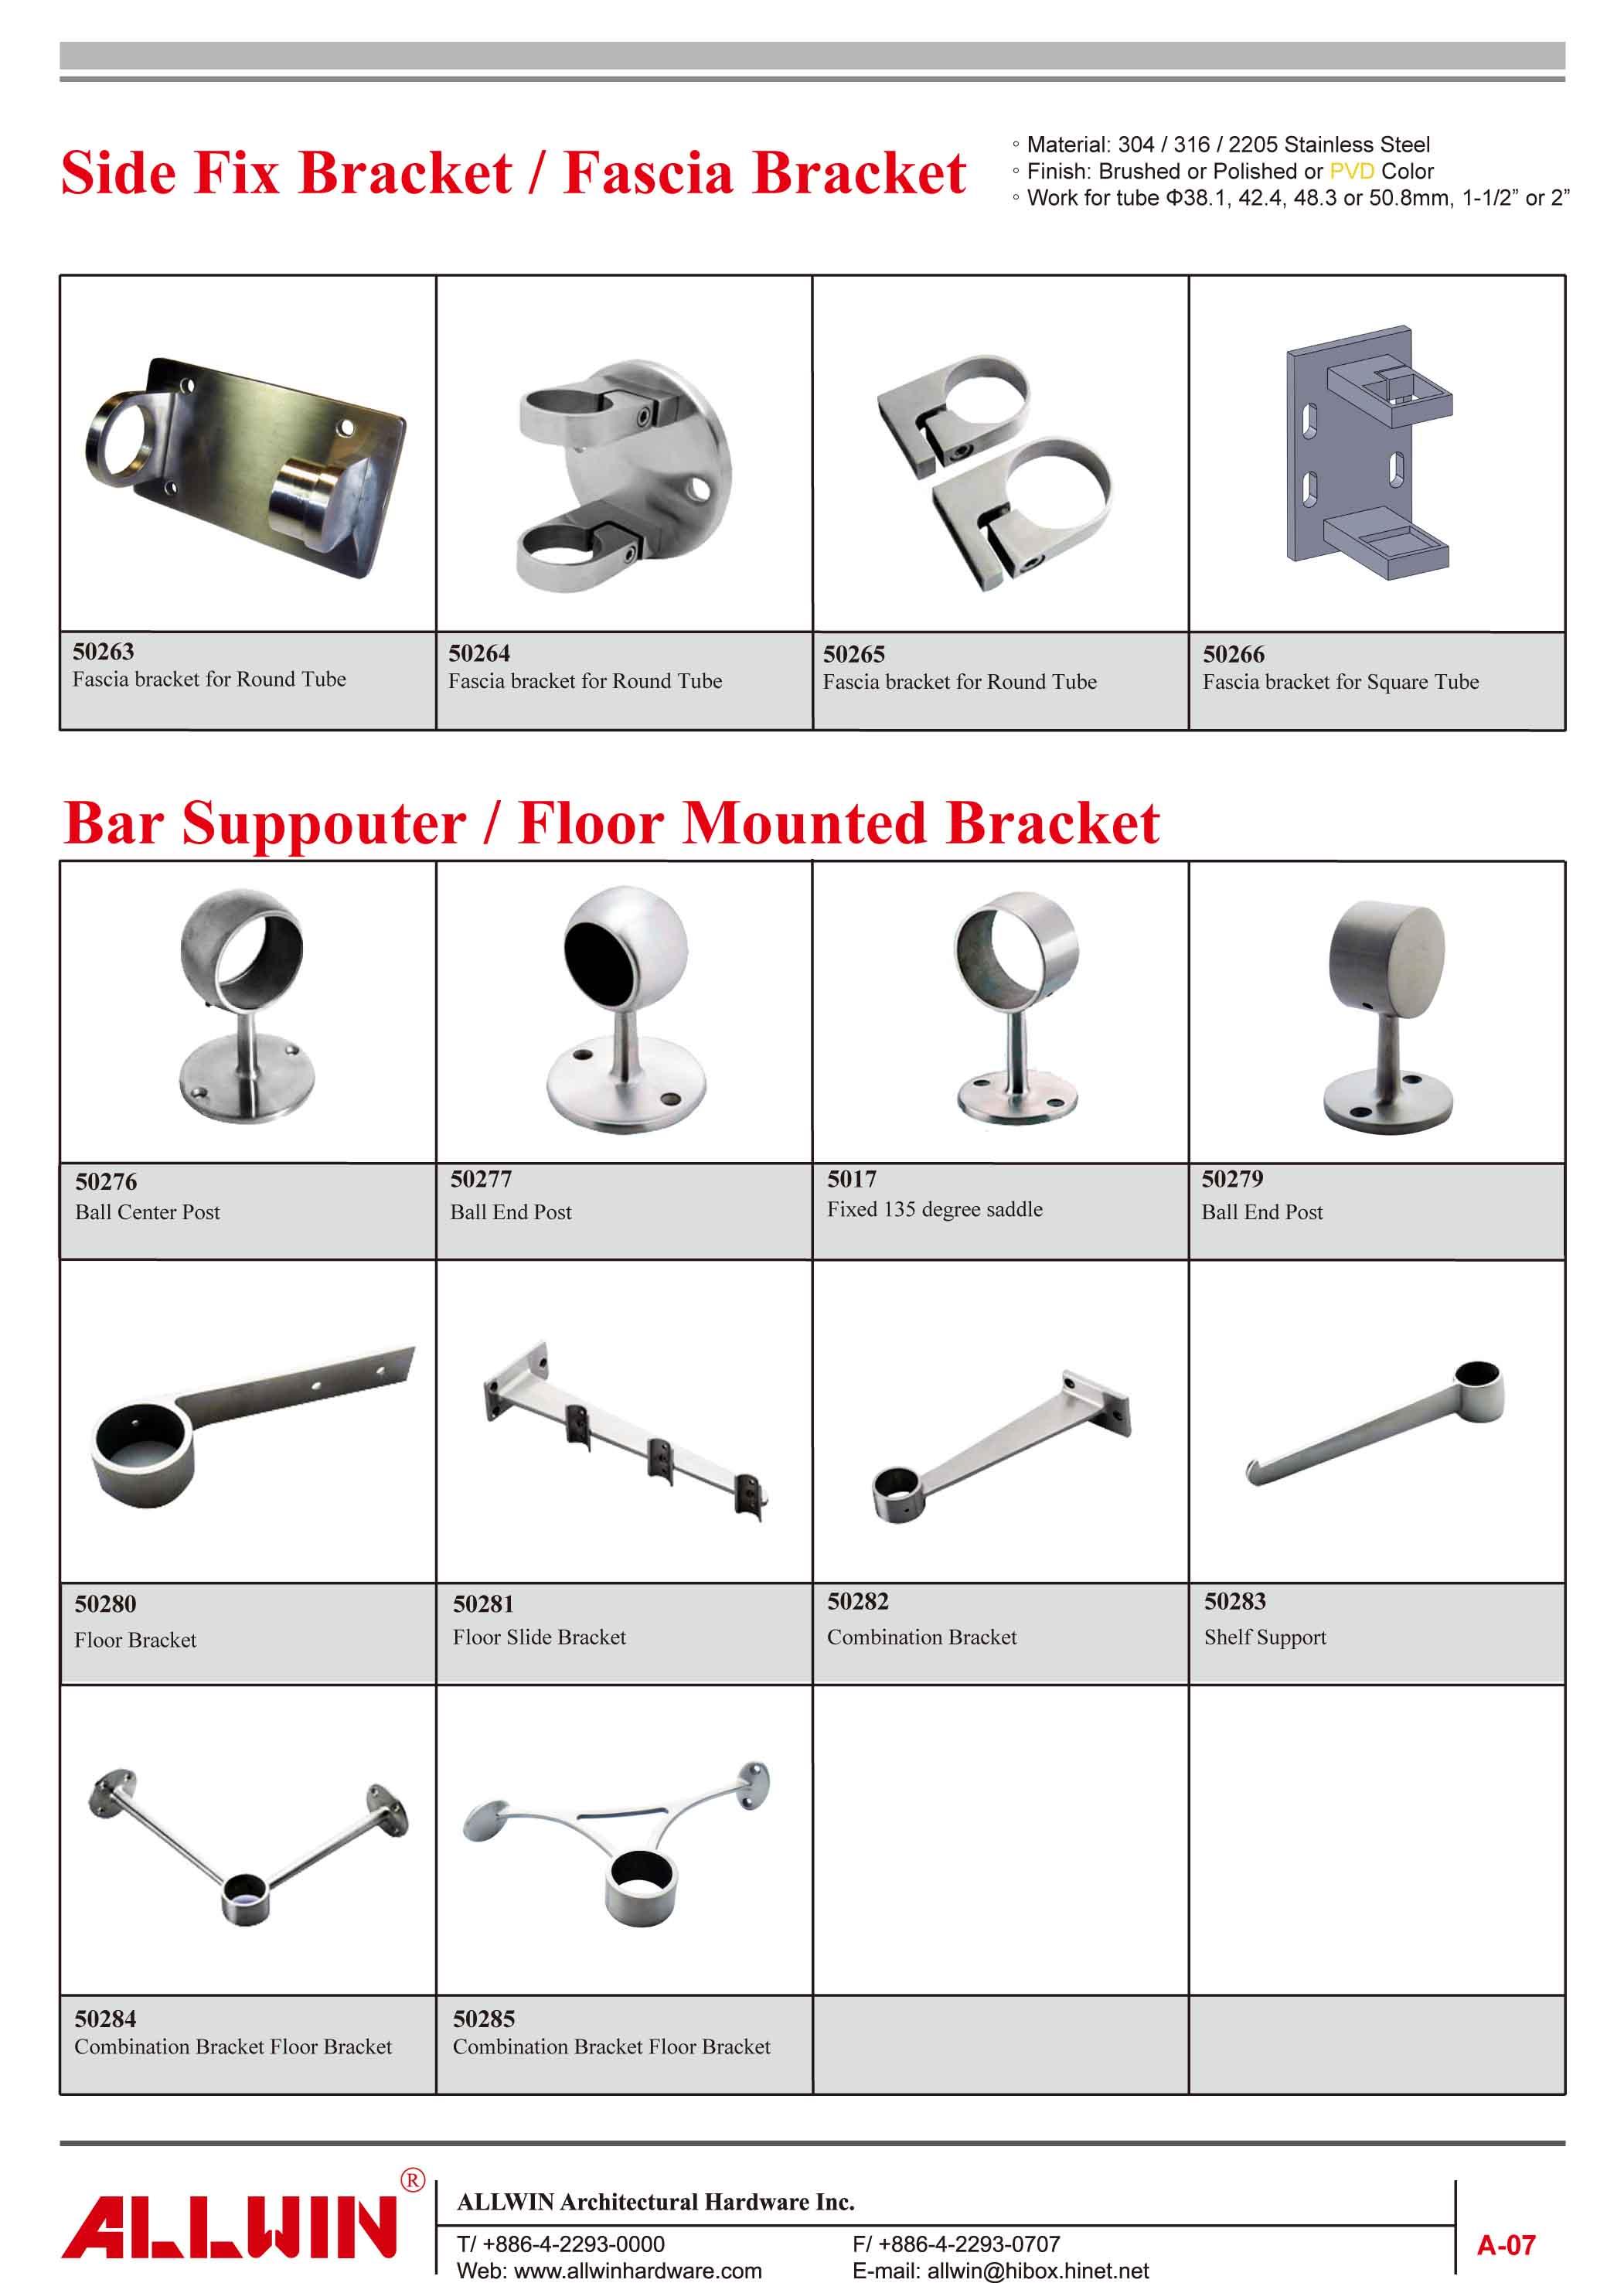 Stainless Steel Ball Center Post Handrail Bracket Step Bar Supporter Connector